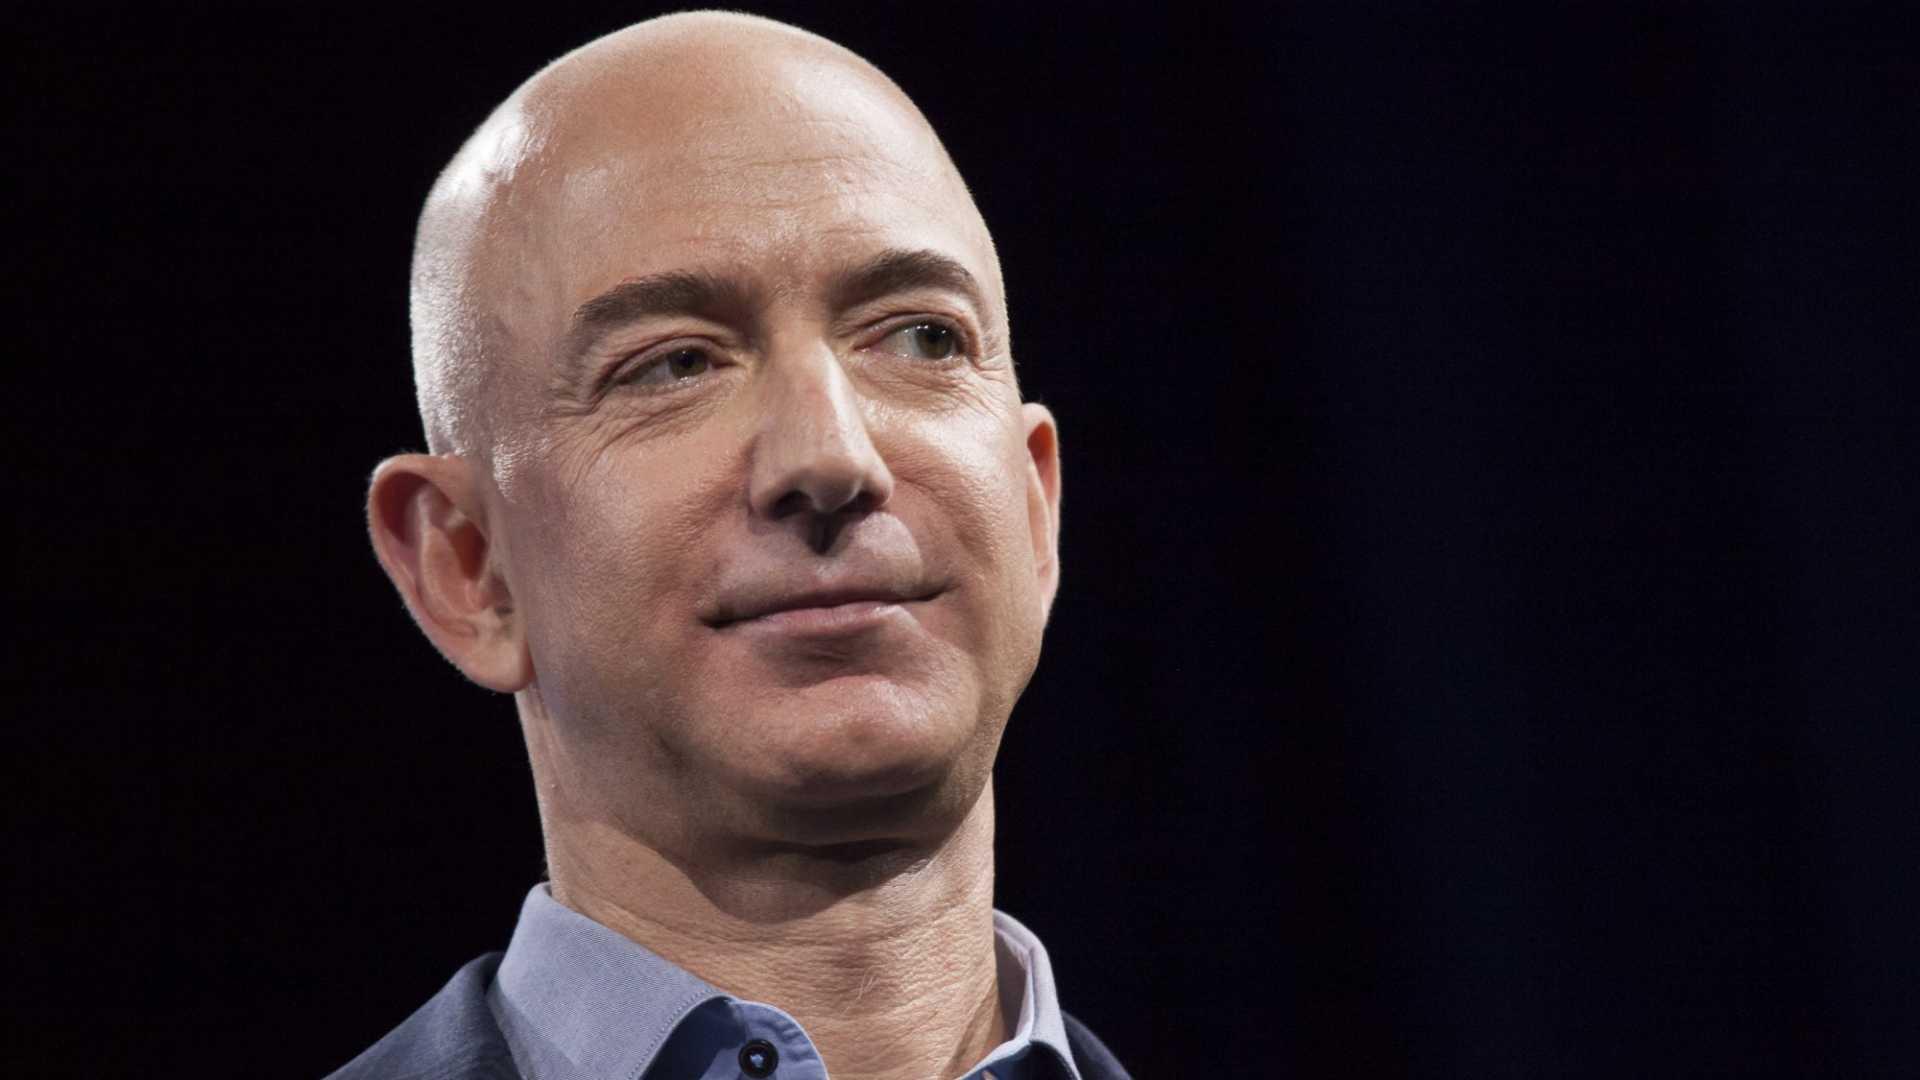 Jeff Bezos, Amazon Alexa, and $84 Billion in Net Worth: How to Build a Robot Army